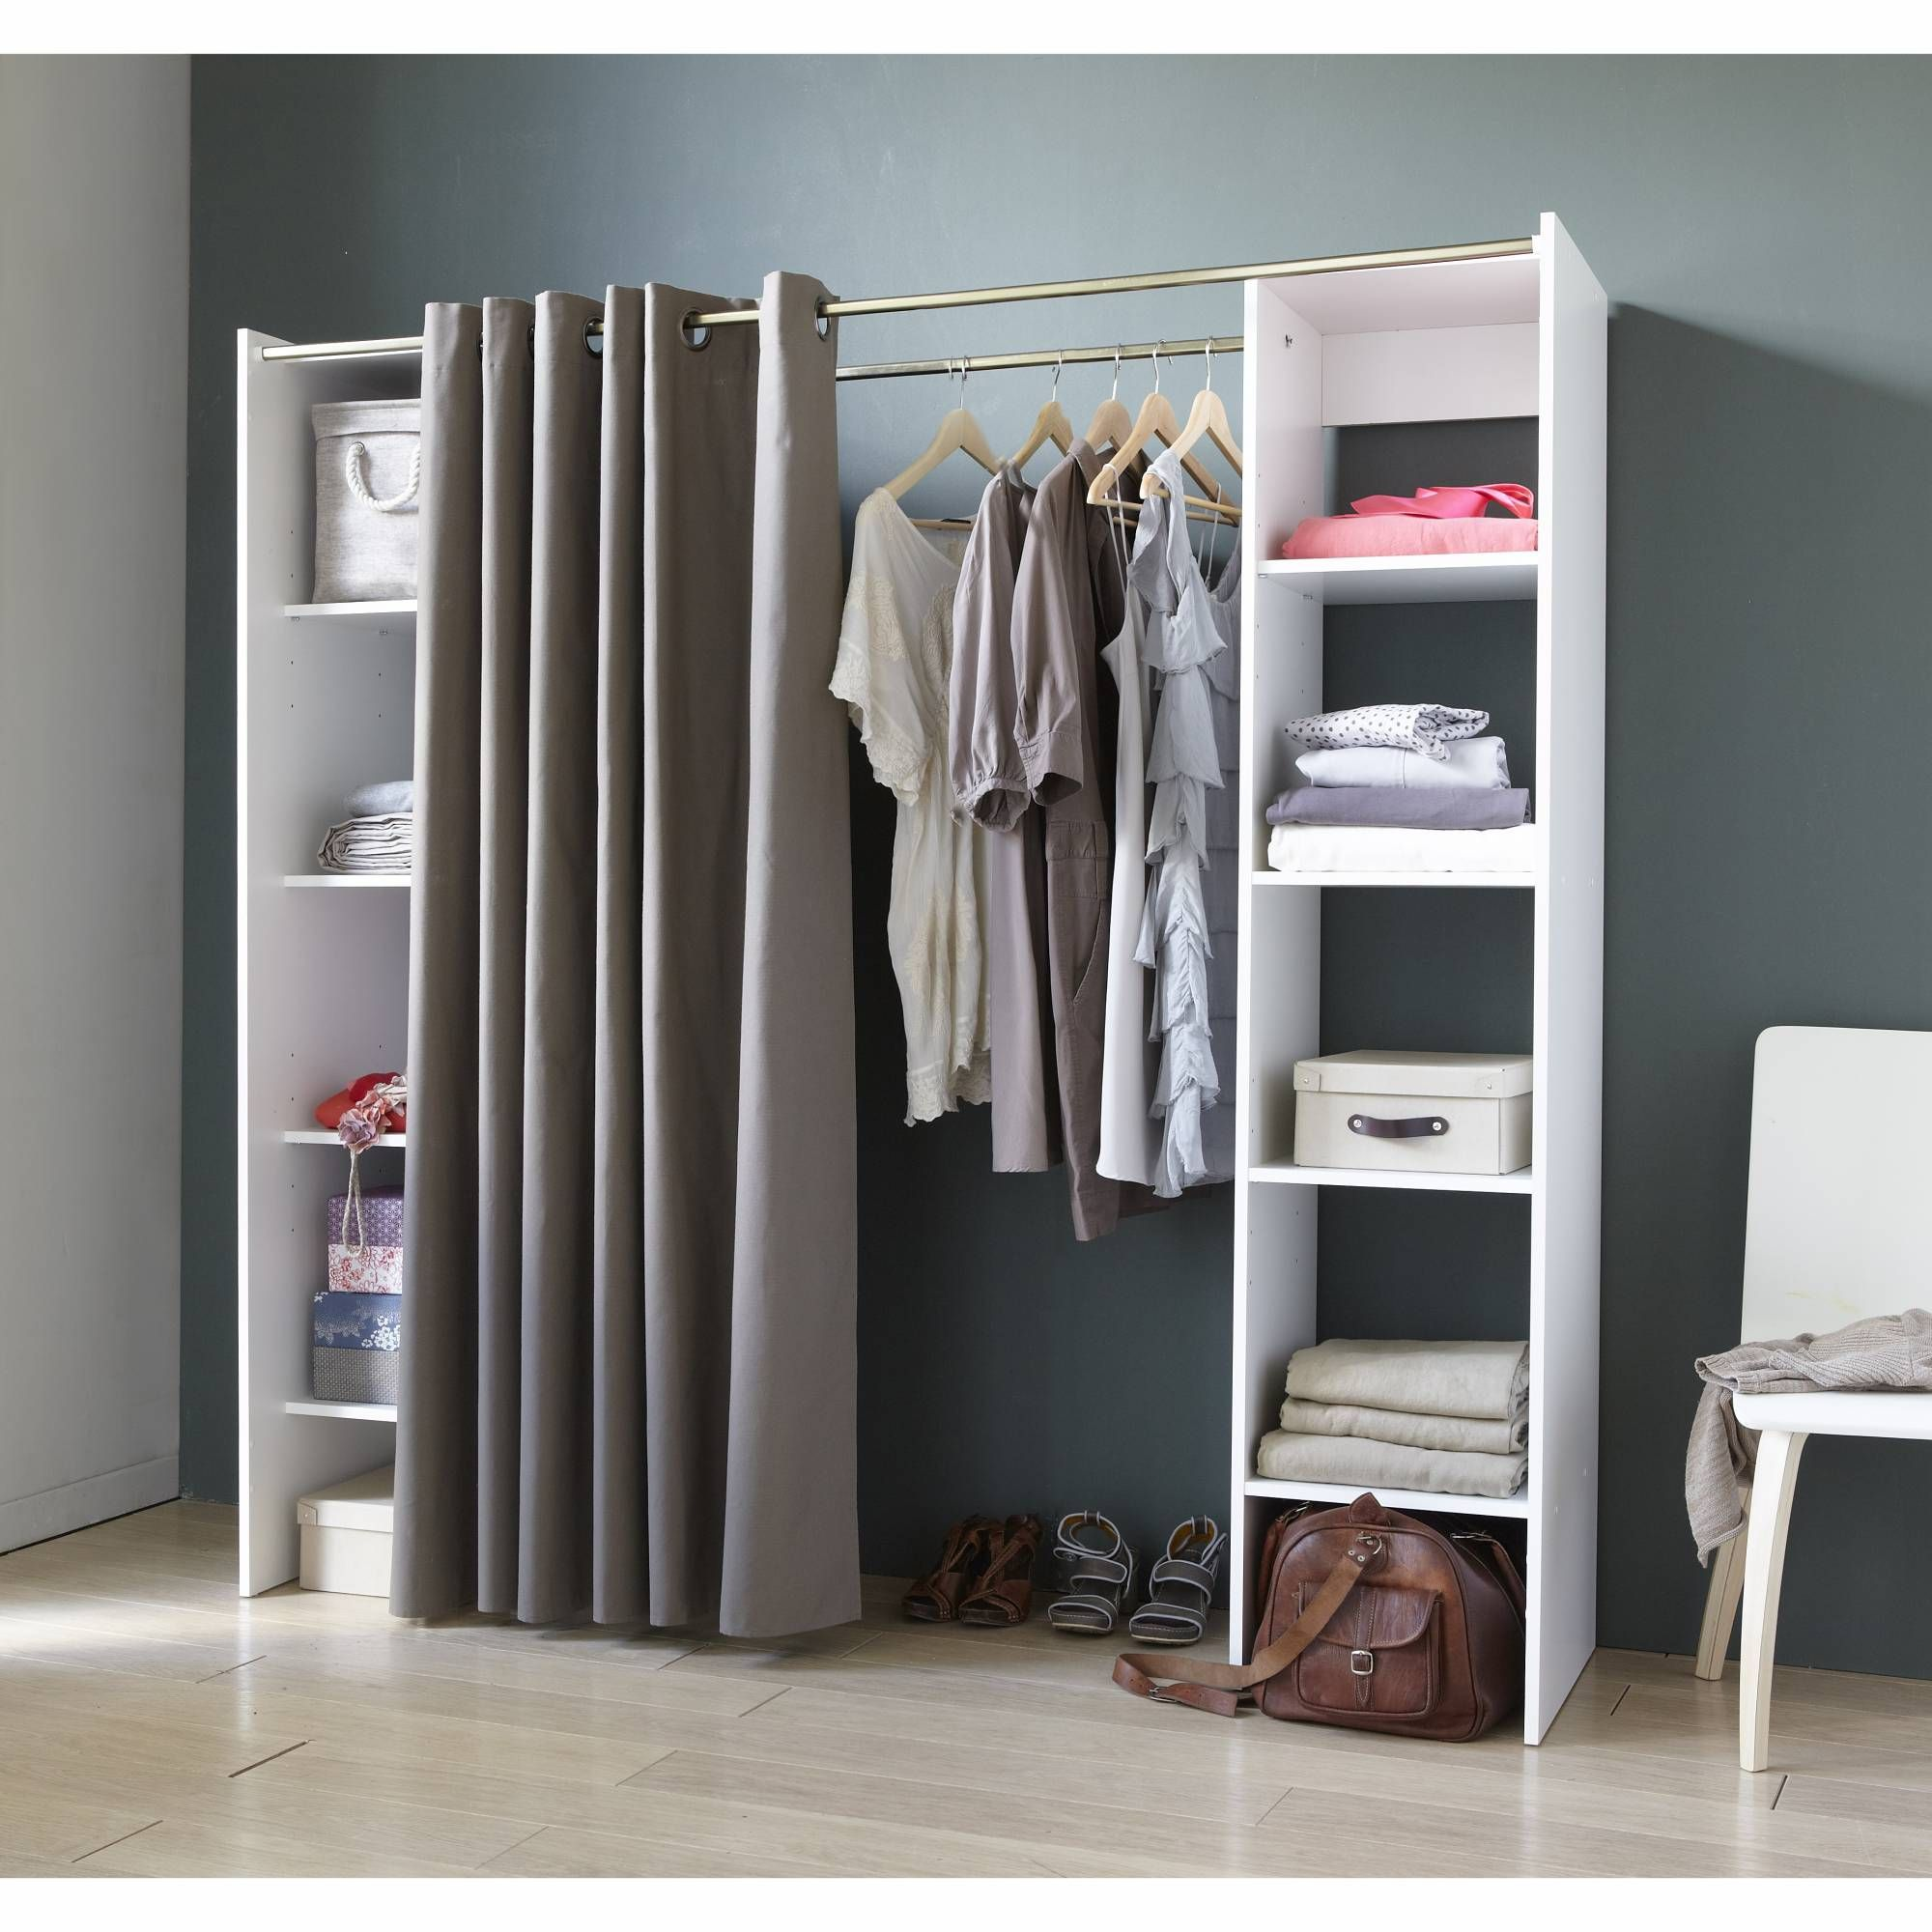 colonne de rangement dressing etagere garage g 233 nial 41 etagere de rangement pour garage. Black Bedroom Furniture Sets. Home Design Ideas